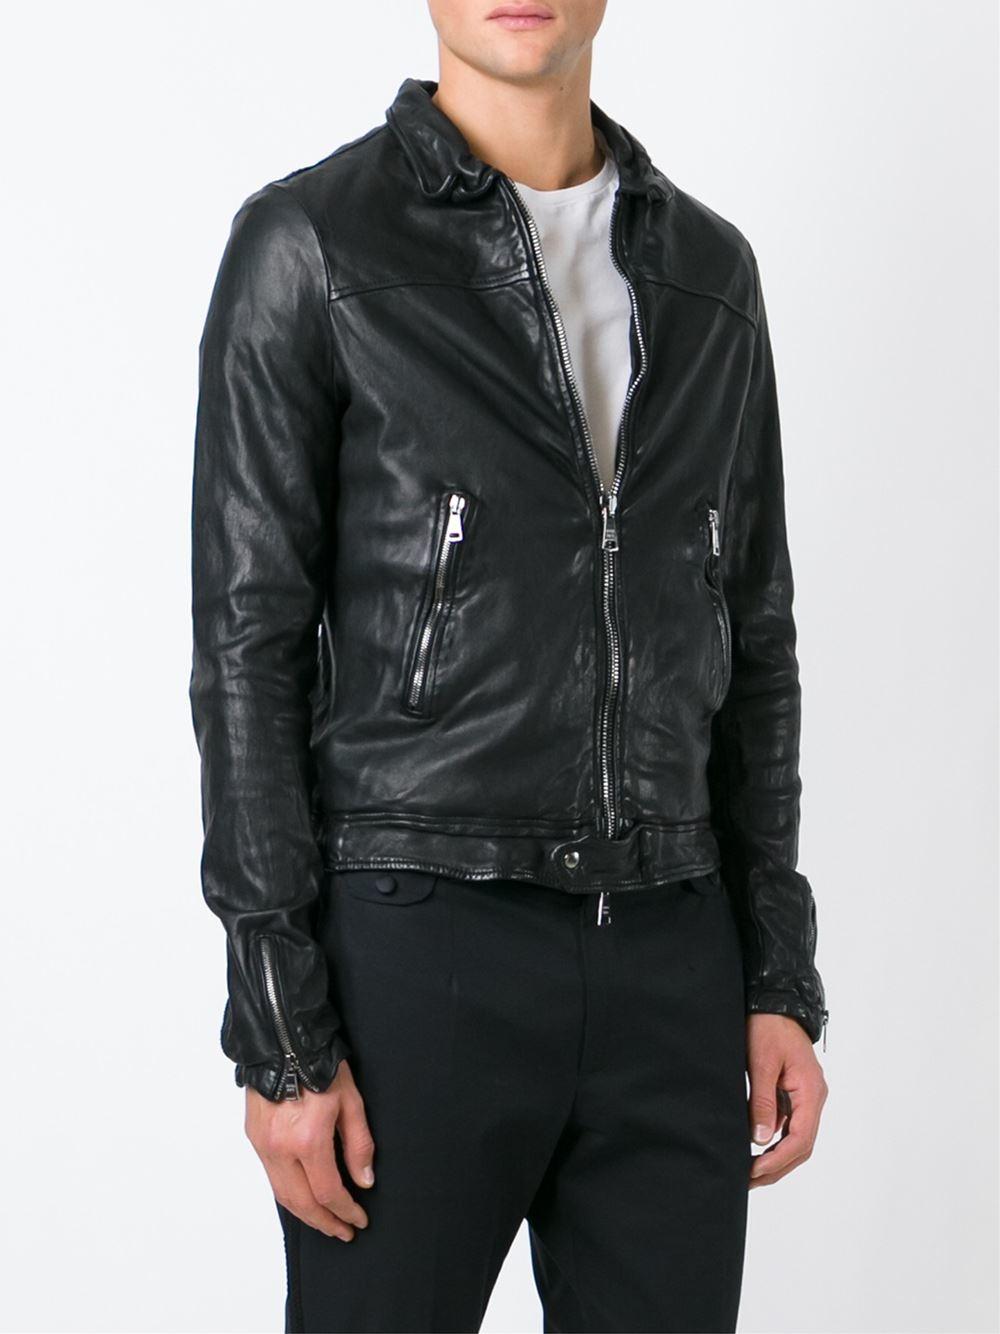 Giorgio Brato Zipped Leather Jacket In Black For Men Lyst